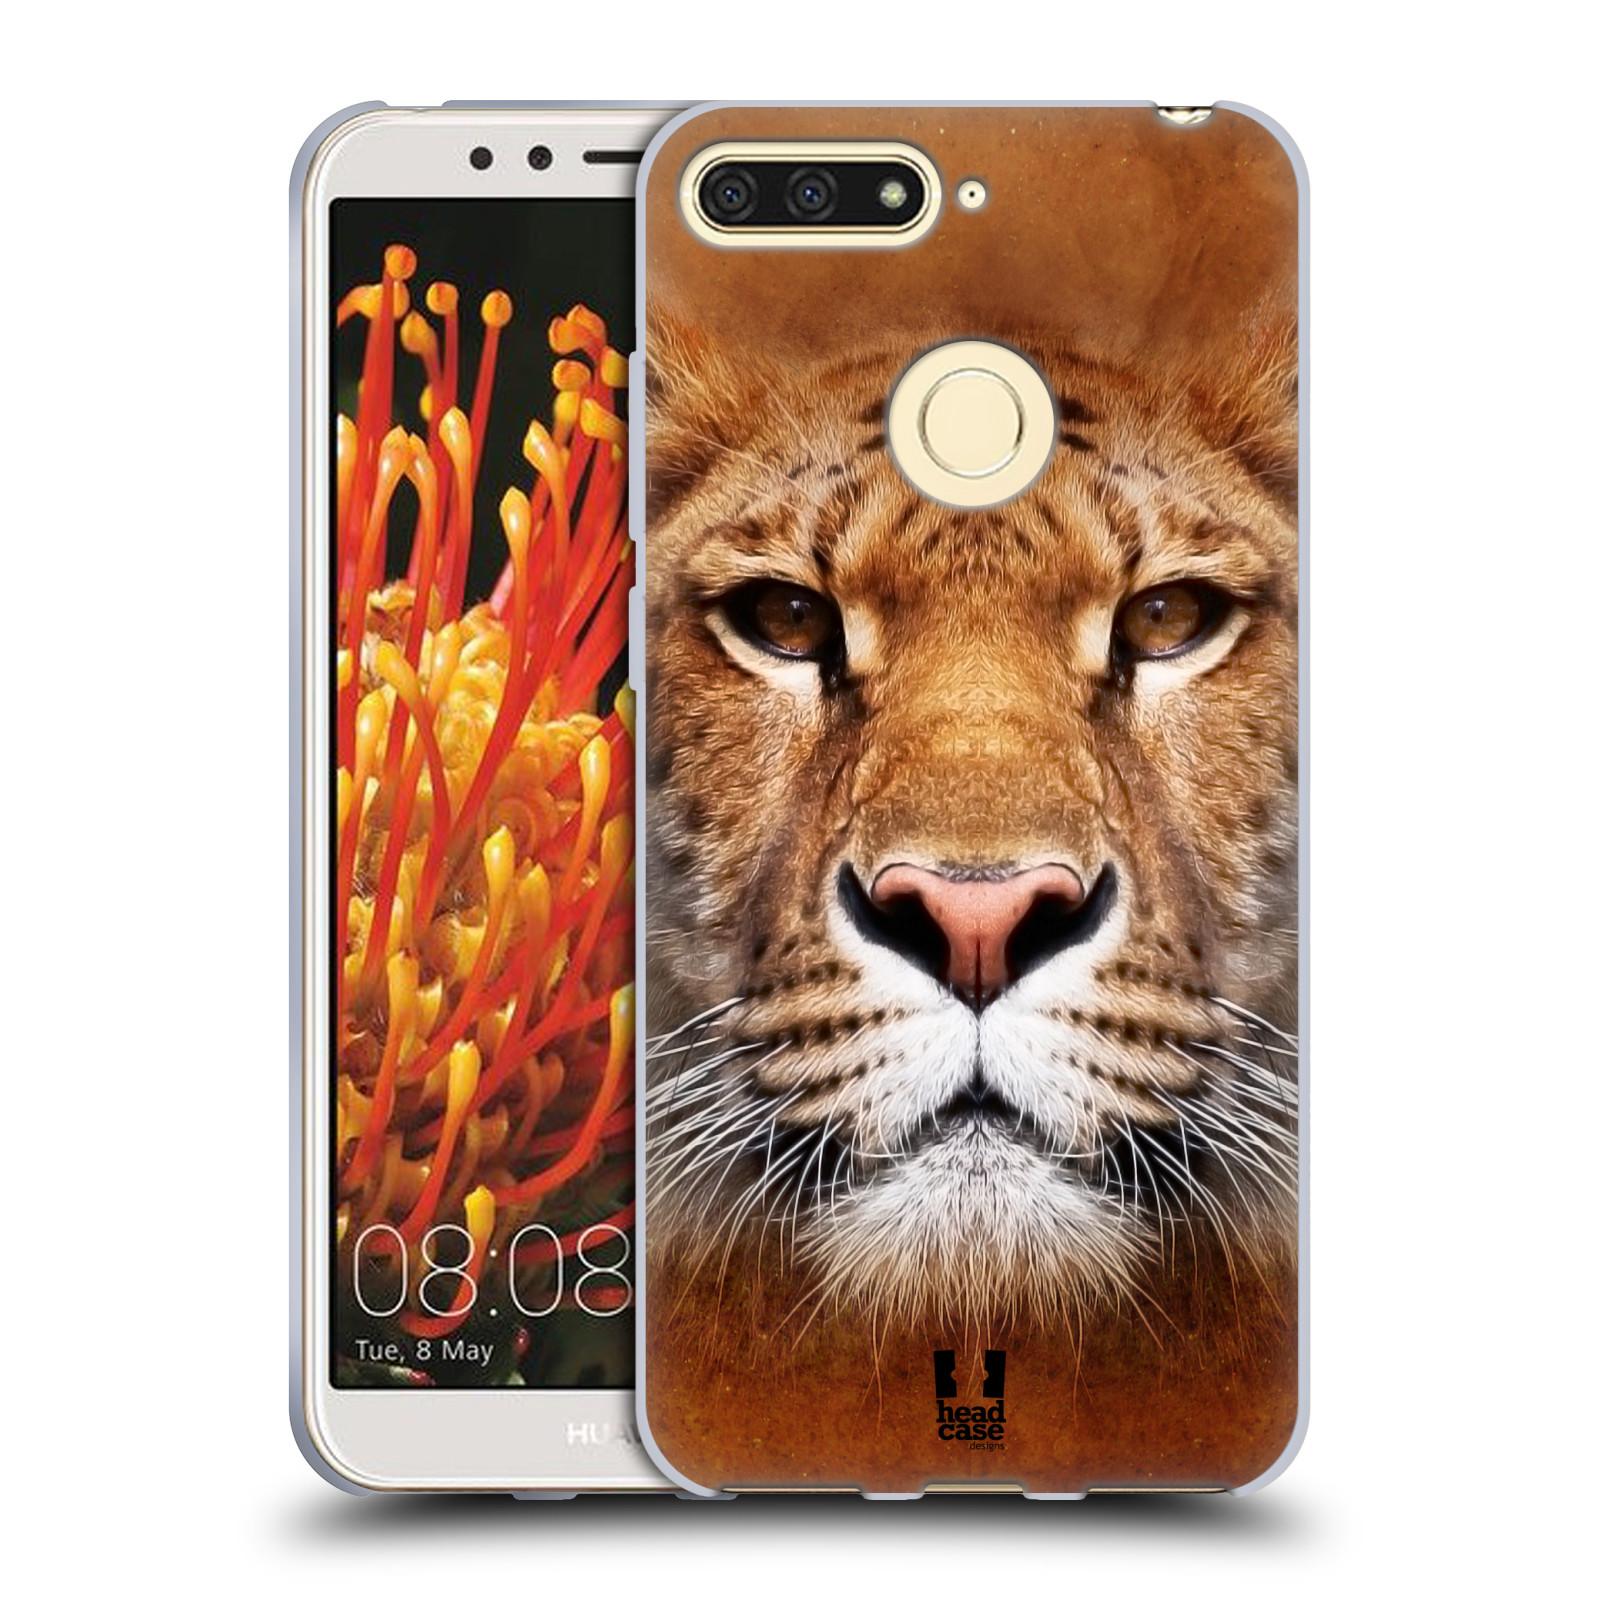 Silikonové pouzdro na mobil Huawei Y6 Prime (2018) - Head Case - TVÁŘ LIGER